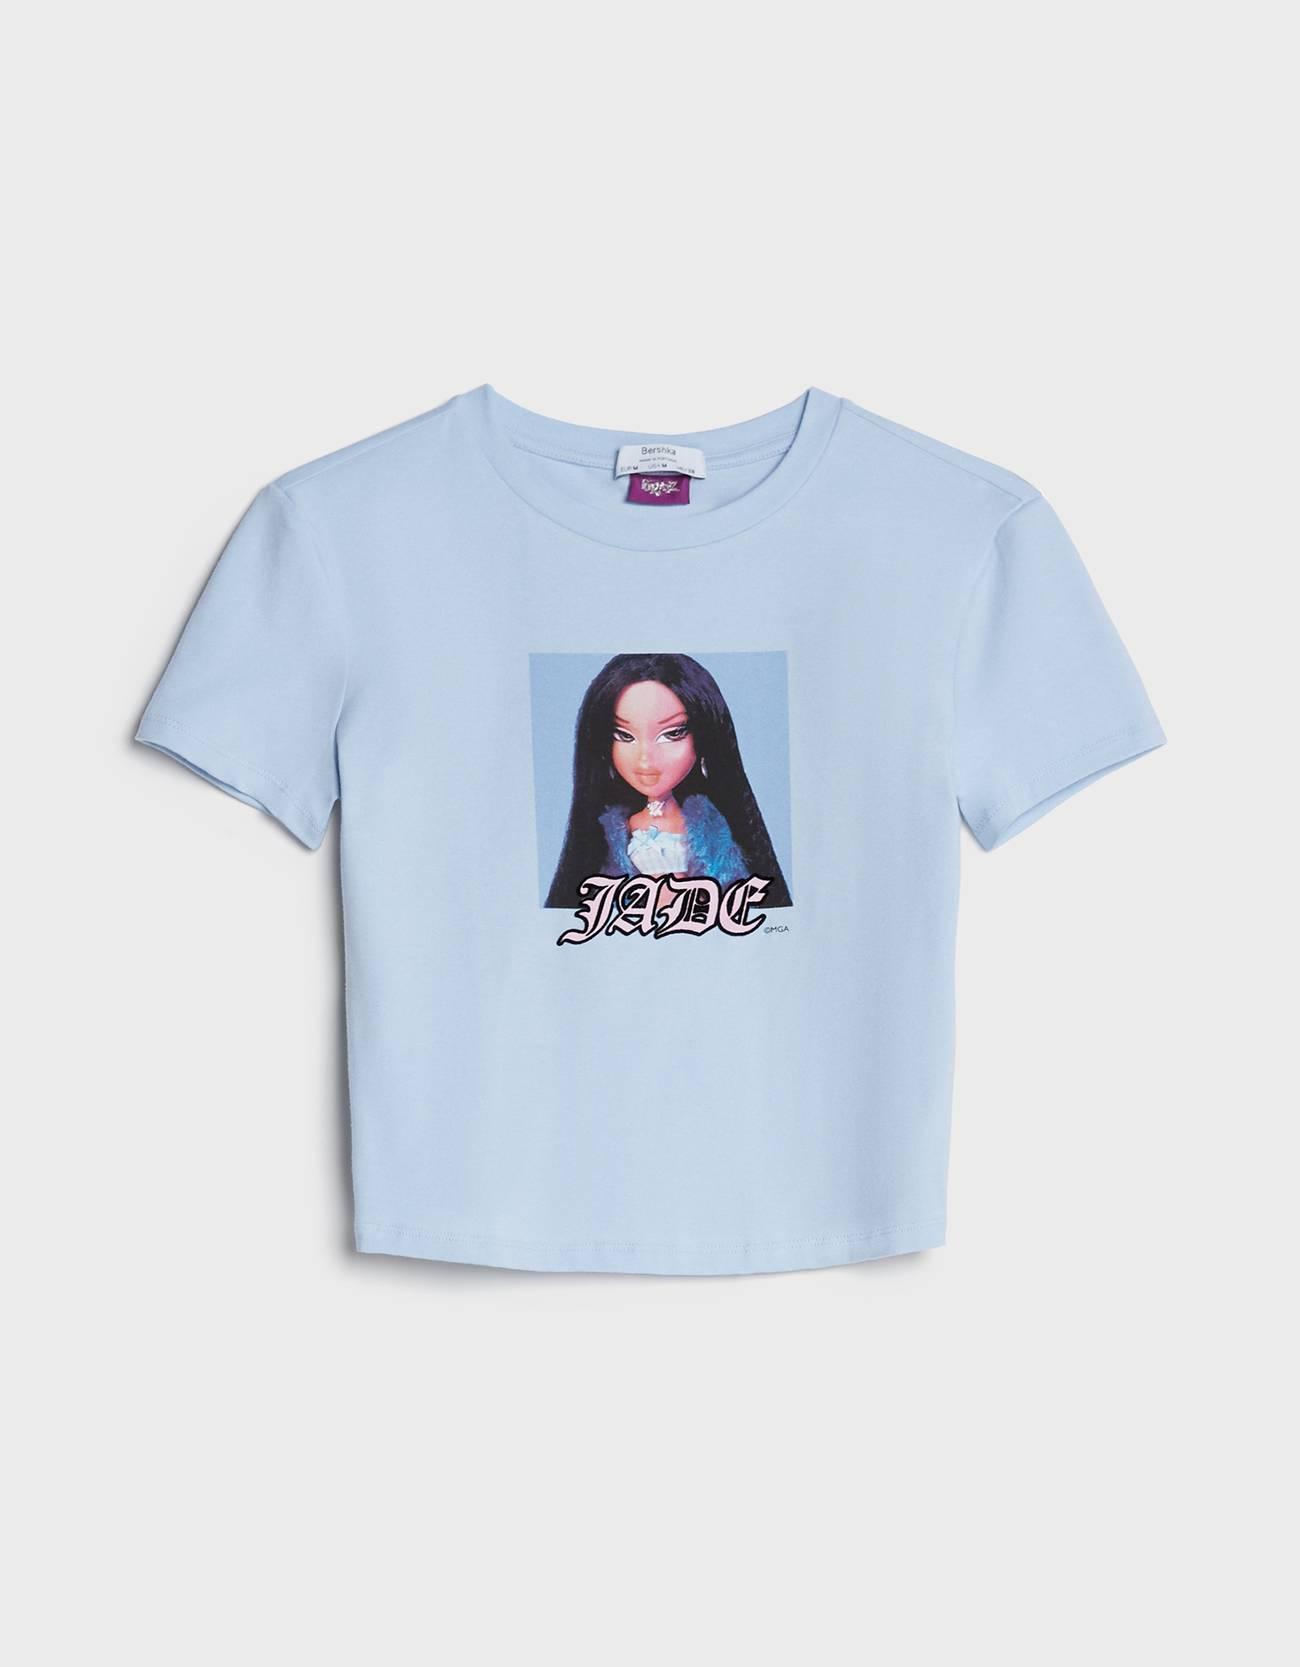 Camiseta cropped de color azul cielo